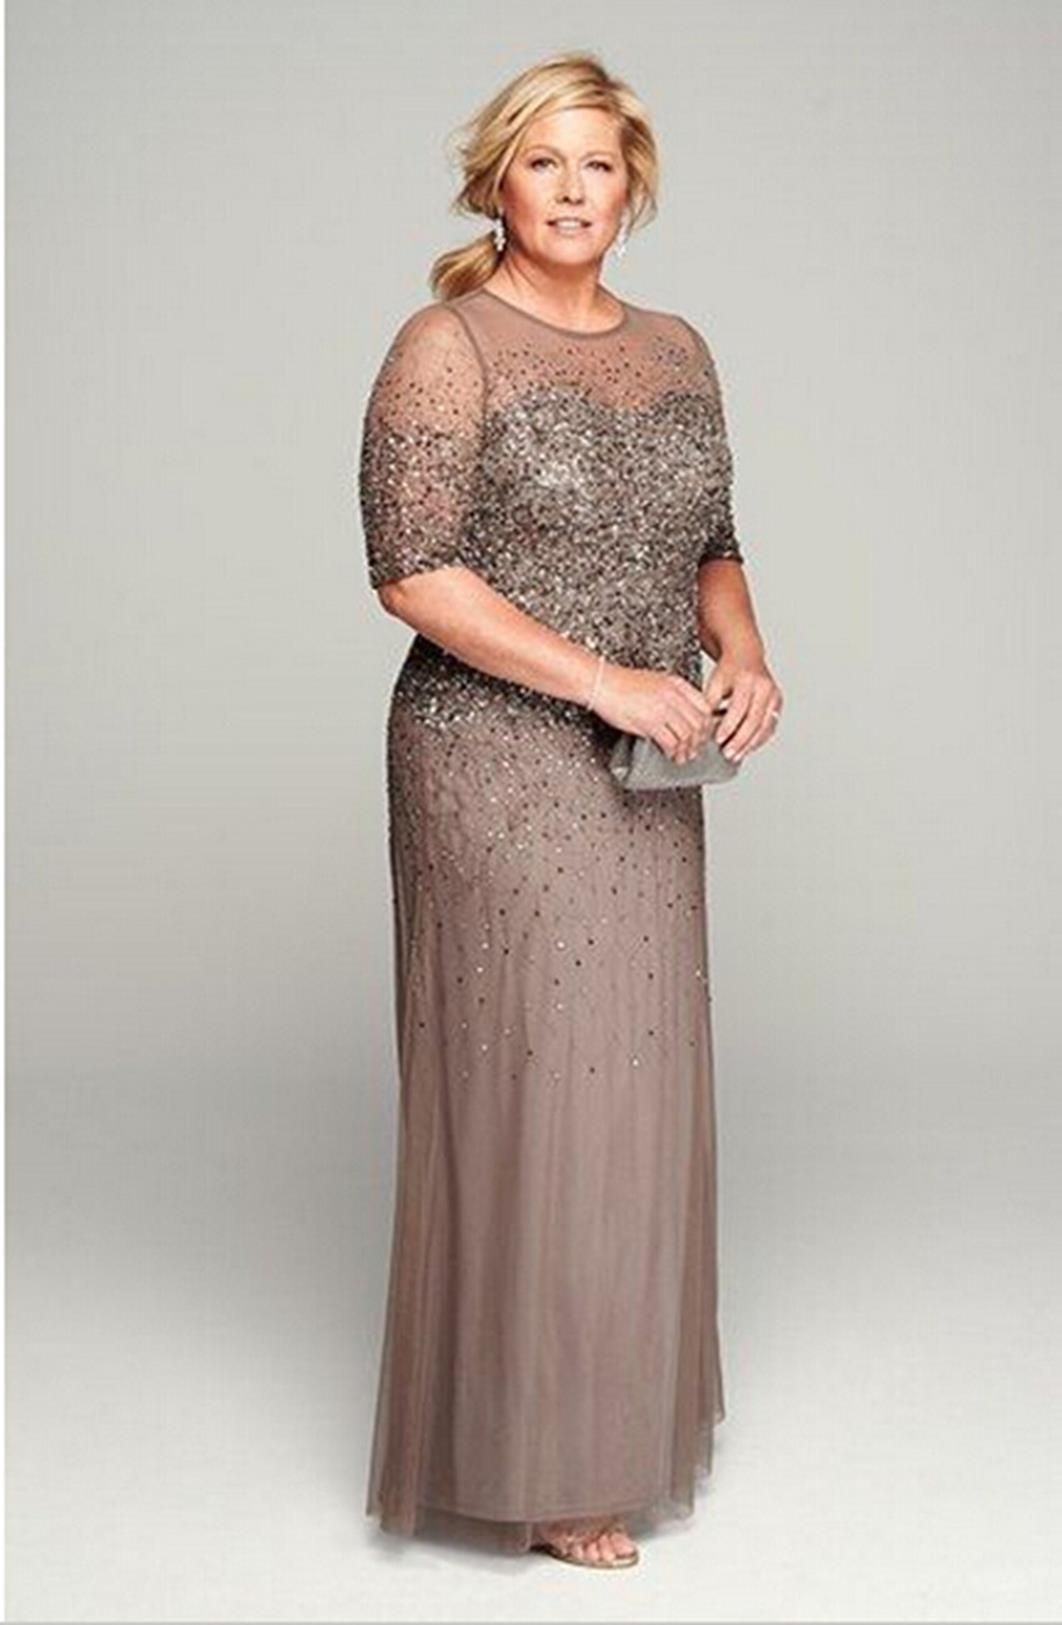 Fashion Wedding Website Mothers Dresses Groom Dress Bride Dress [ 1625 x 1062 Pixel ]